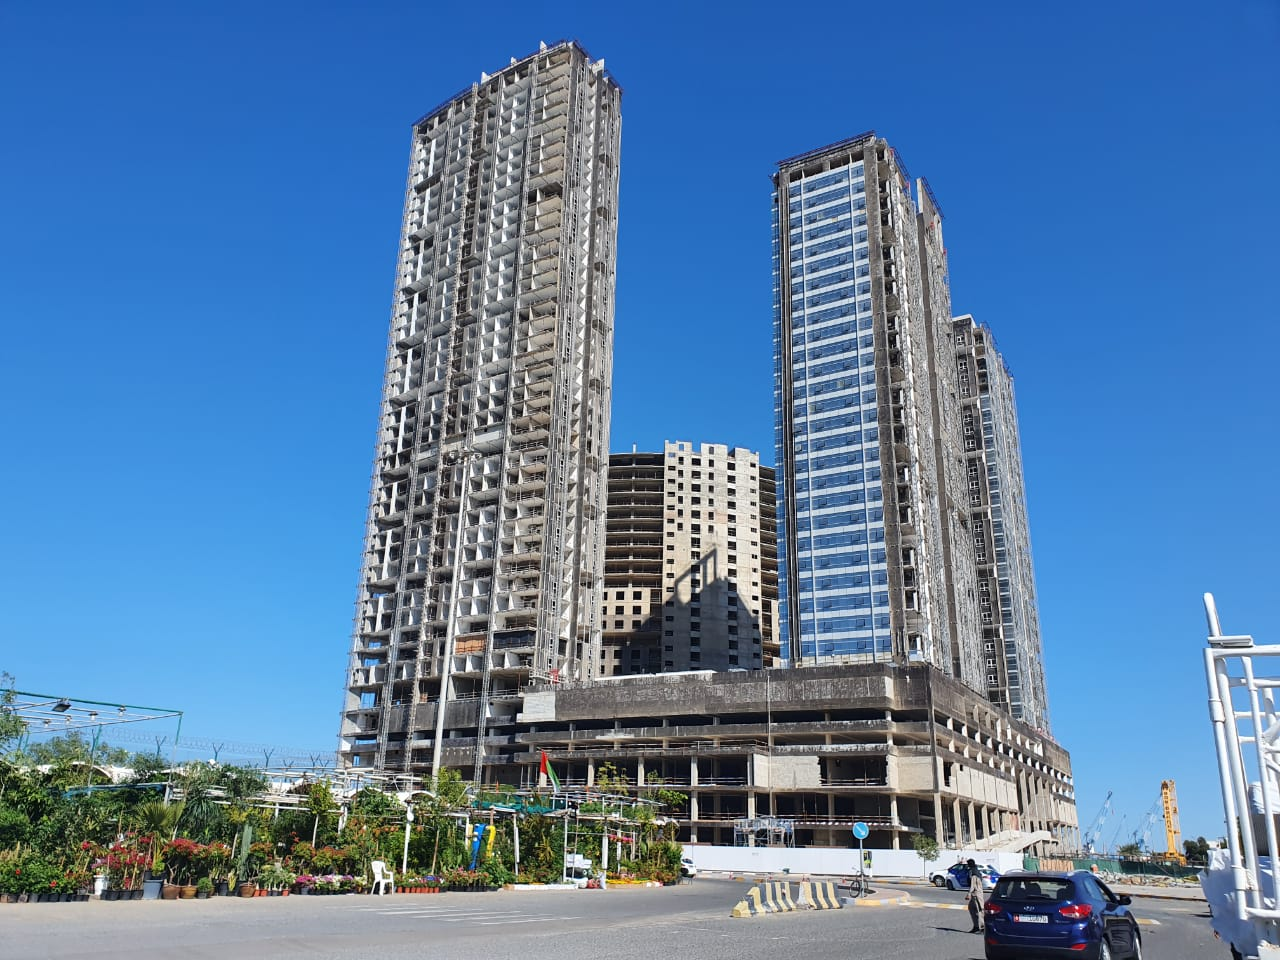 Experimental test to demolish 4 towers in Abu Dhabi